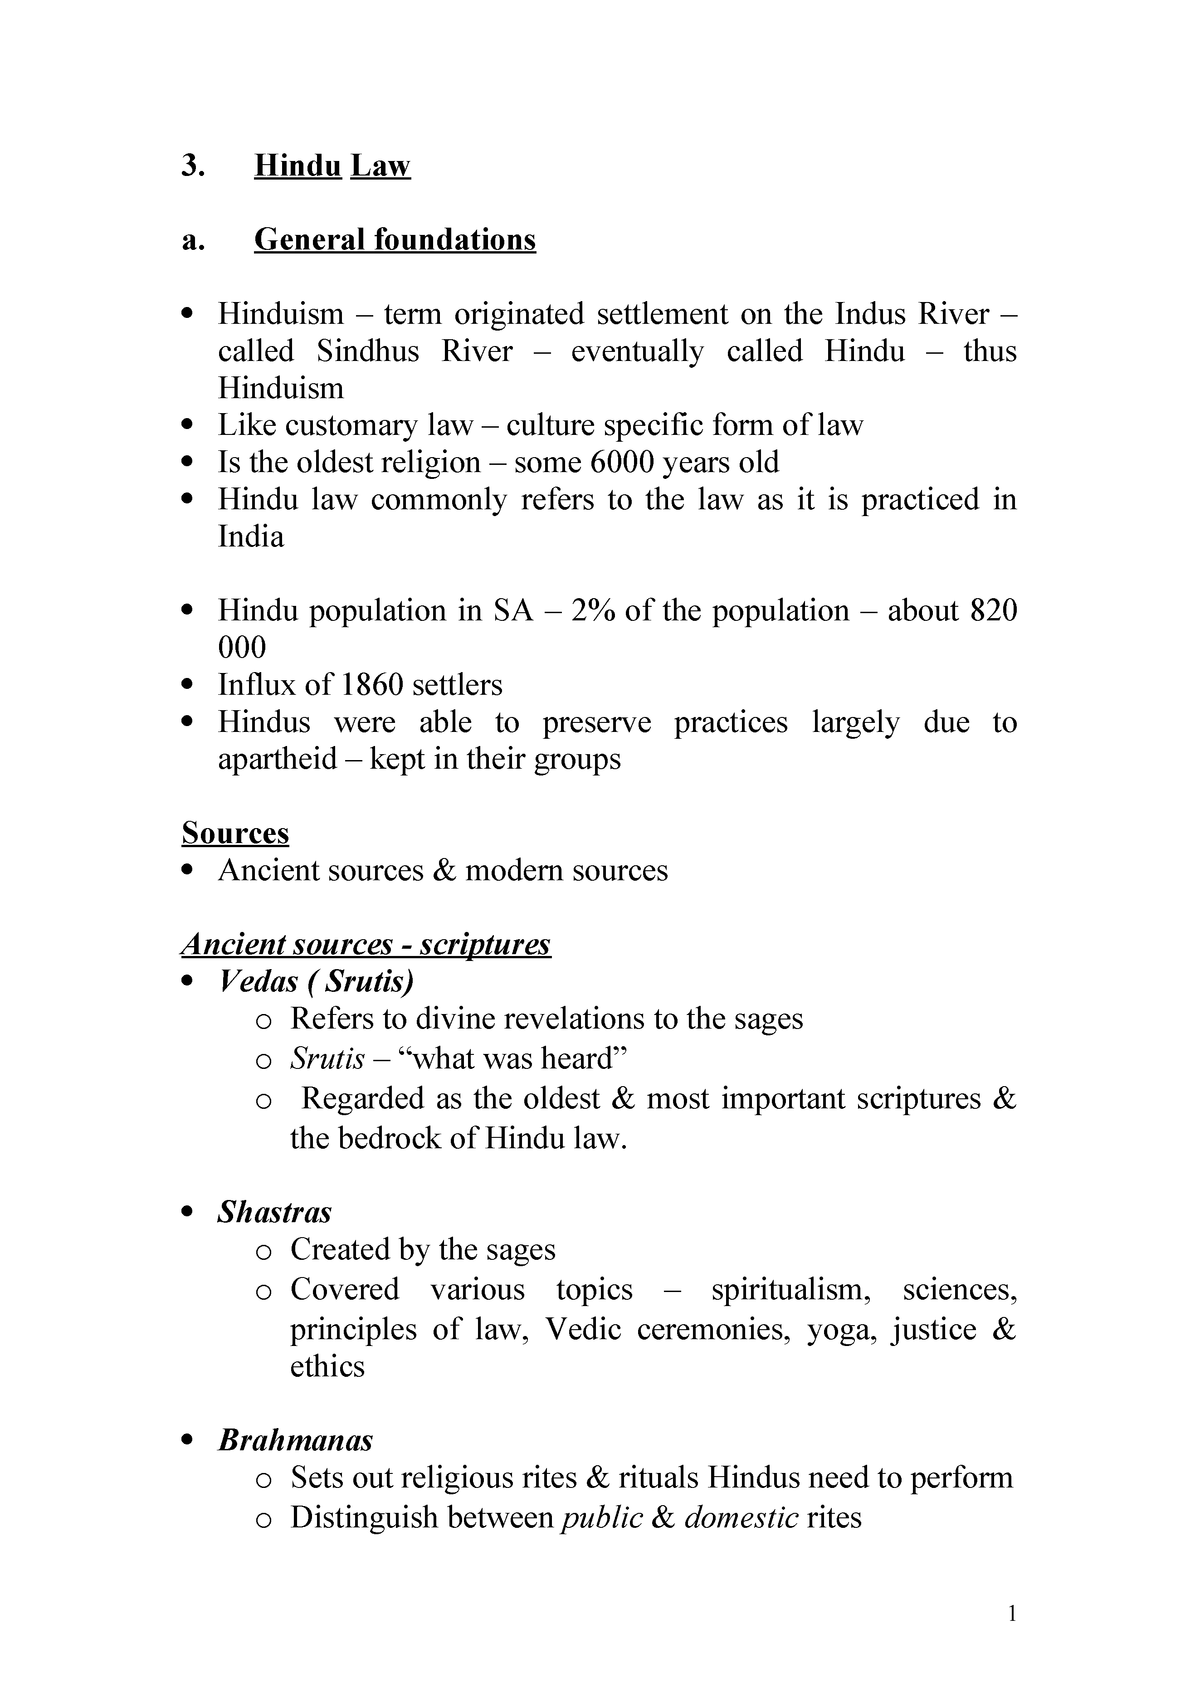 Hindu law document - Legal Diversity LAWS3LDH1 - SUN - StuDocu